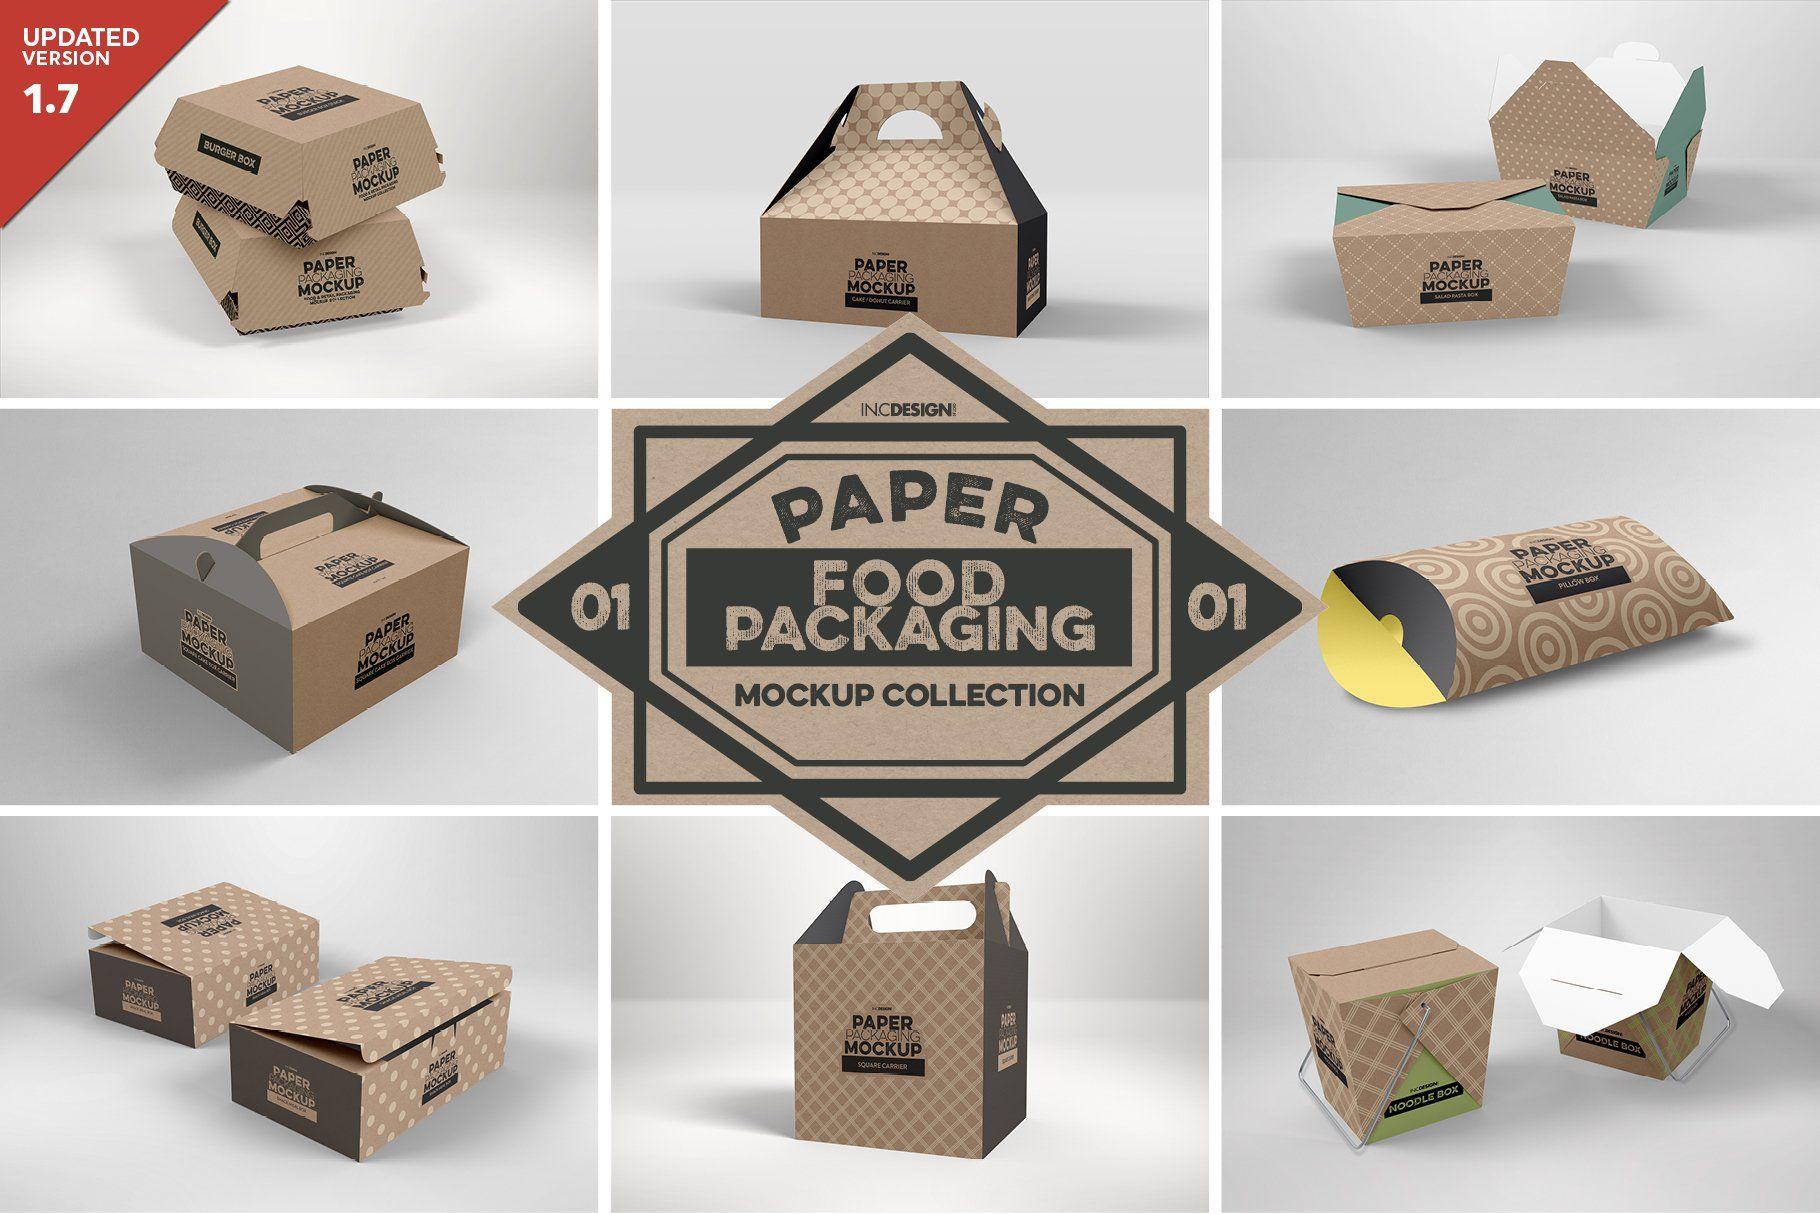 Download Vol 1 Food Box Packaging Mockups 64683 Branding Design Bundles In 2021 Food Box Packaging Packaging Mockup Fastfood Packaging